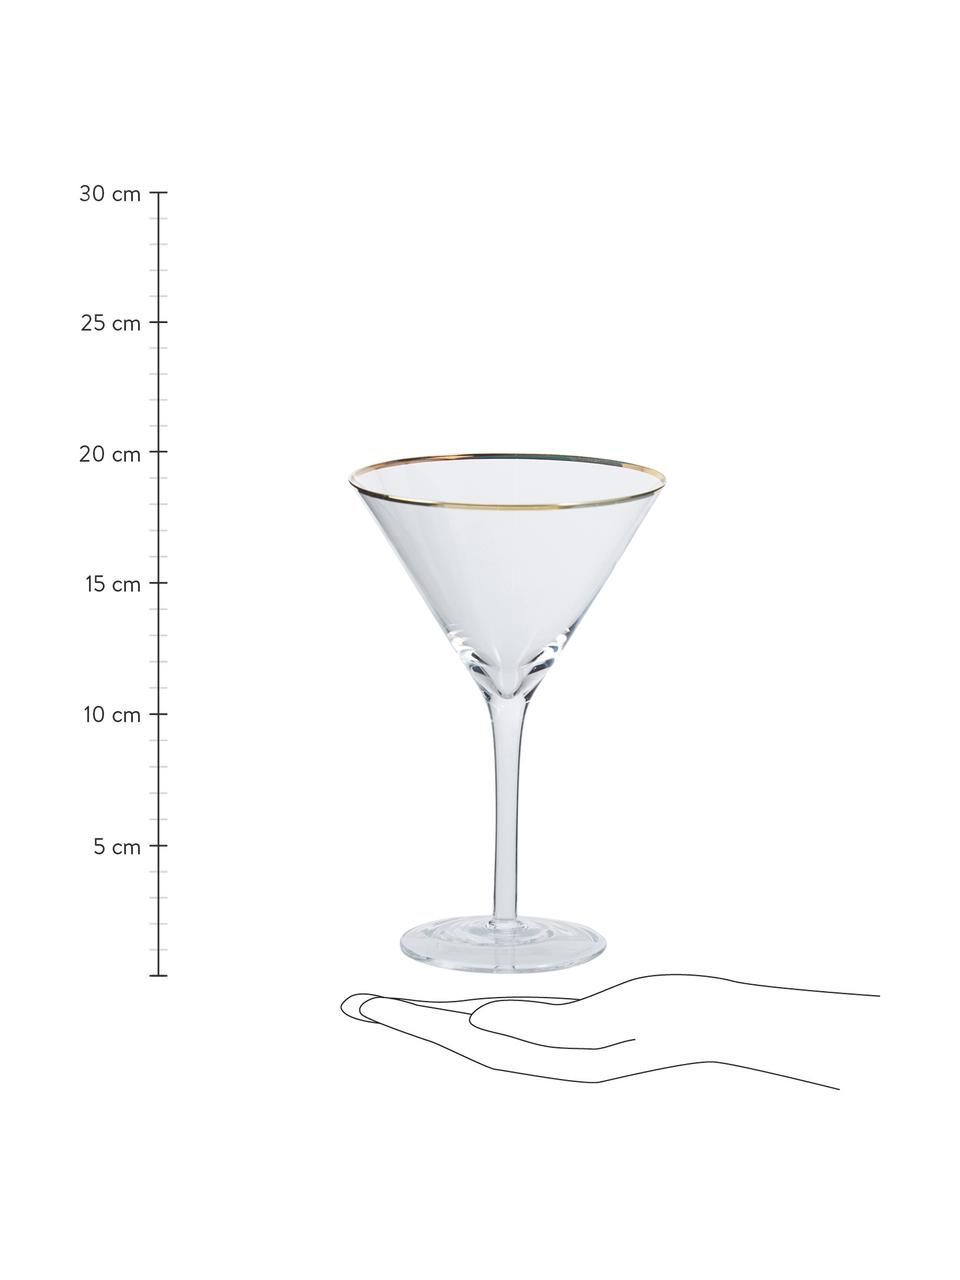 Martinigläser Chloe in Transparent mit Goldrand, 4 Stück, Glas, Transparent, Ø 12 x H 19 cm